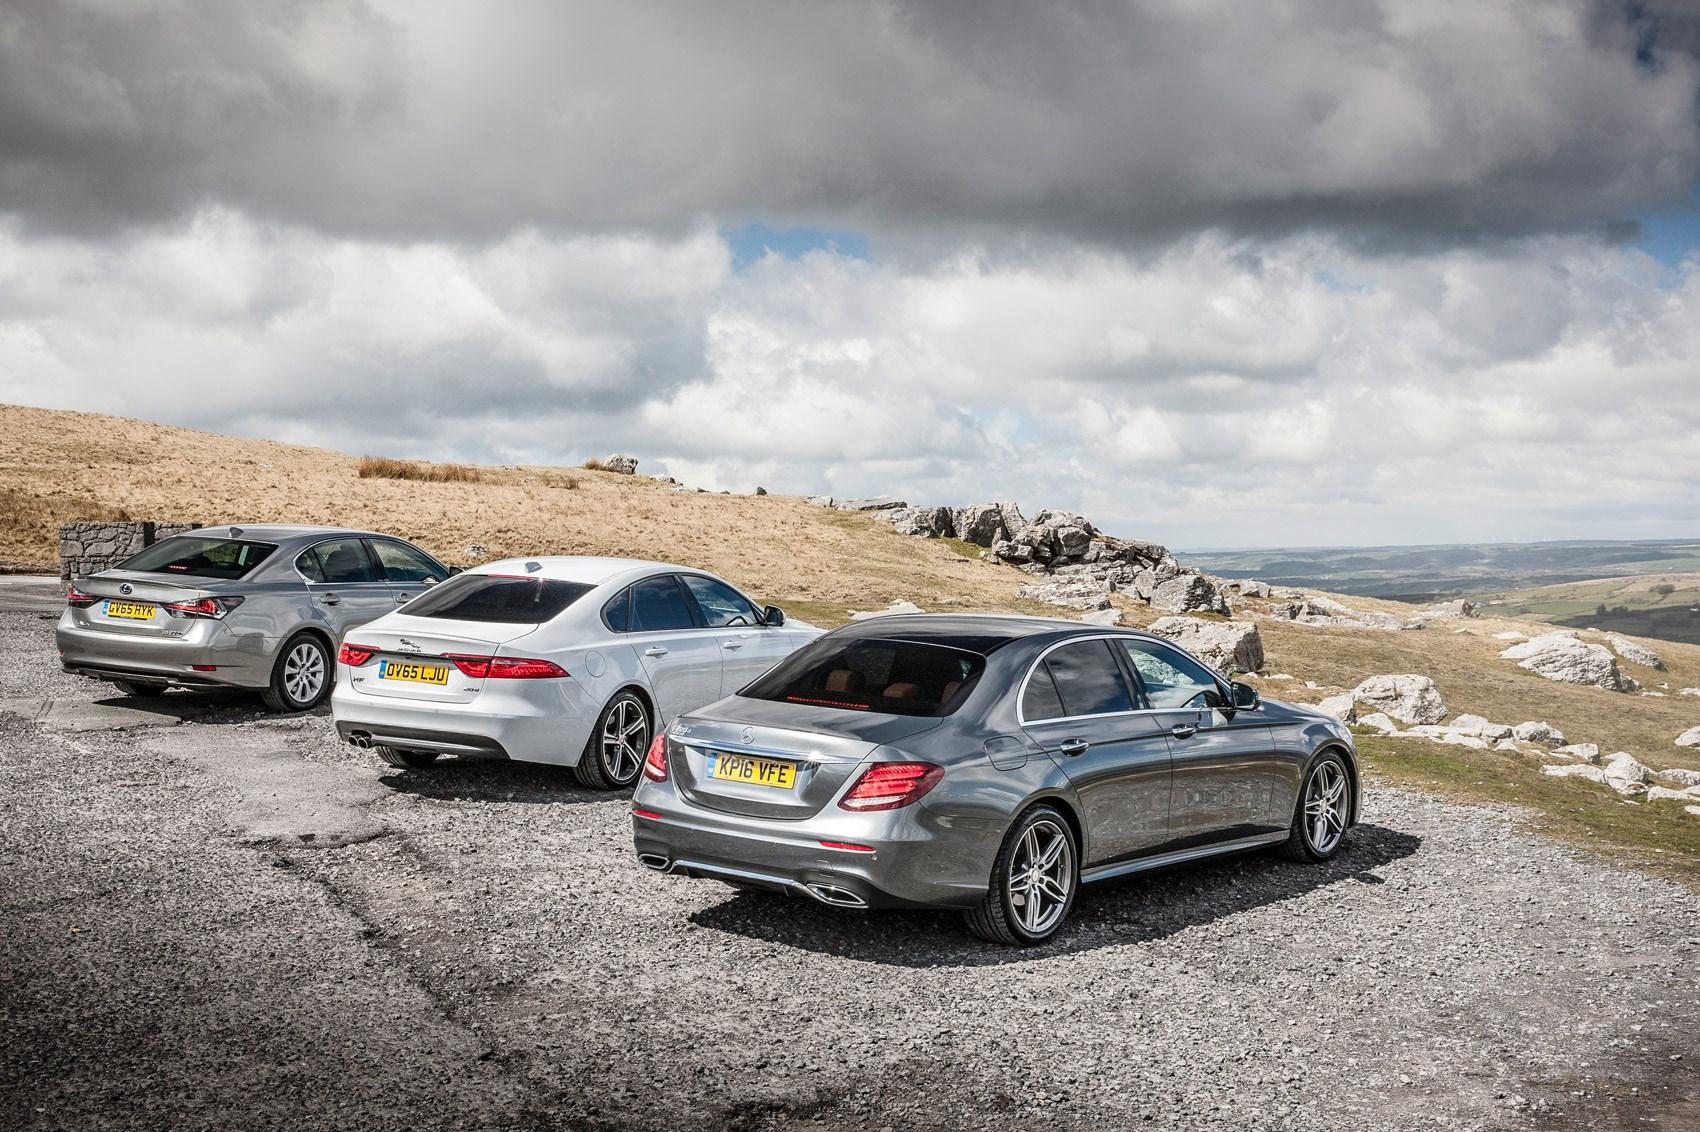 Giant test mercedes benz e class vs jaguar xf vs lexus gs for Mercedes benz gs